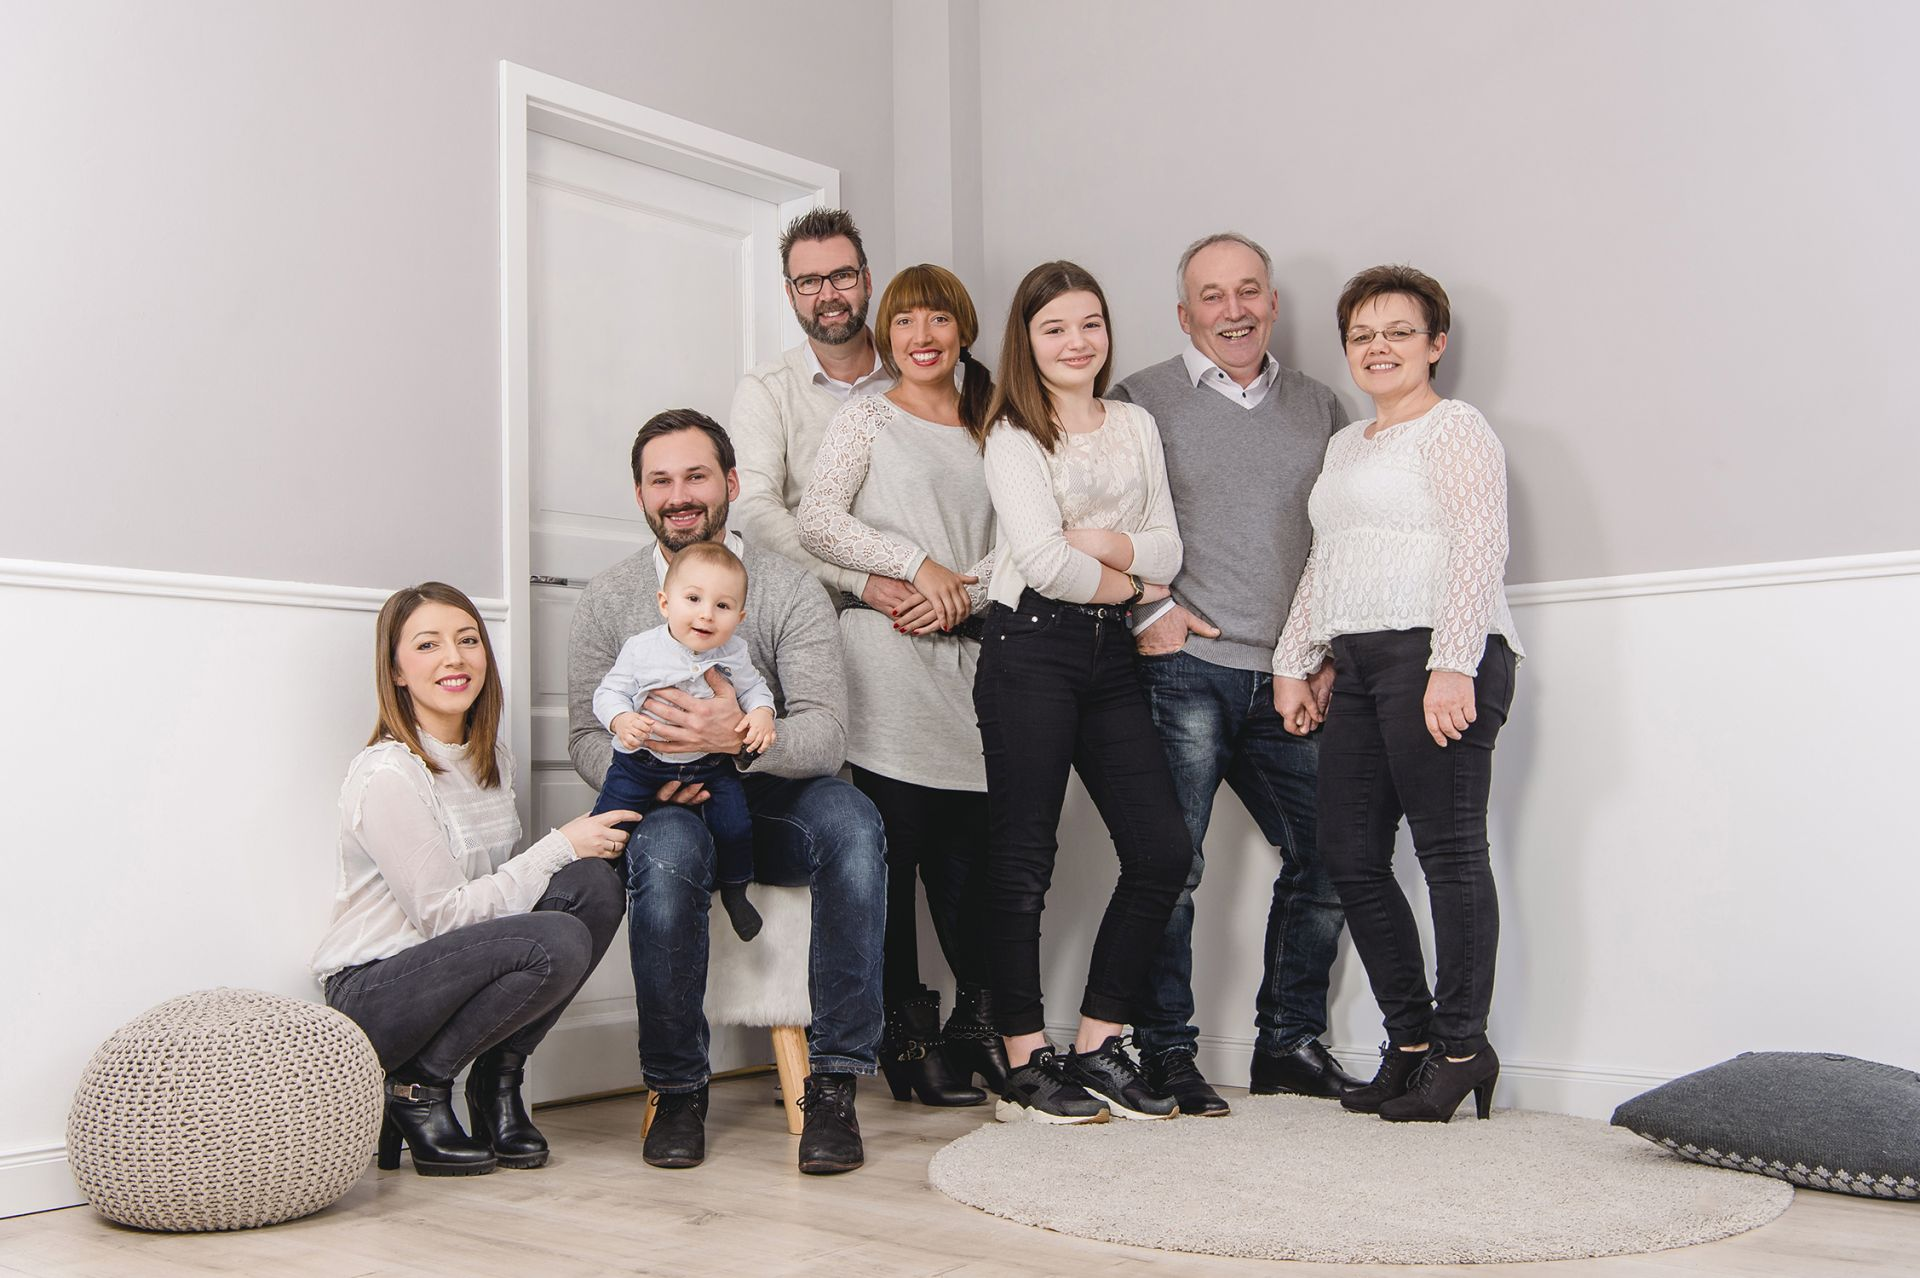 Familienfotos-Familienfotografie-Porträtfotografie-Fotografie-Katharina-Müller-Limburg-Eschhofen-www.fotografie-km.de-Indoor-und-Outdoor-Kinderfotografie-Shootingtipps